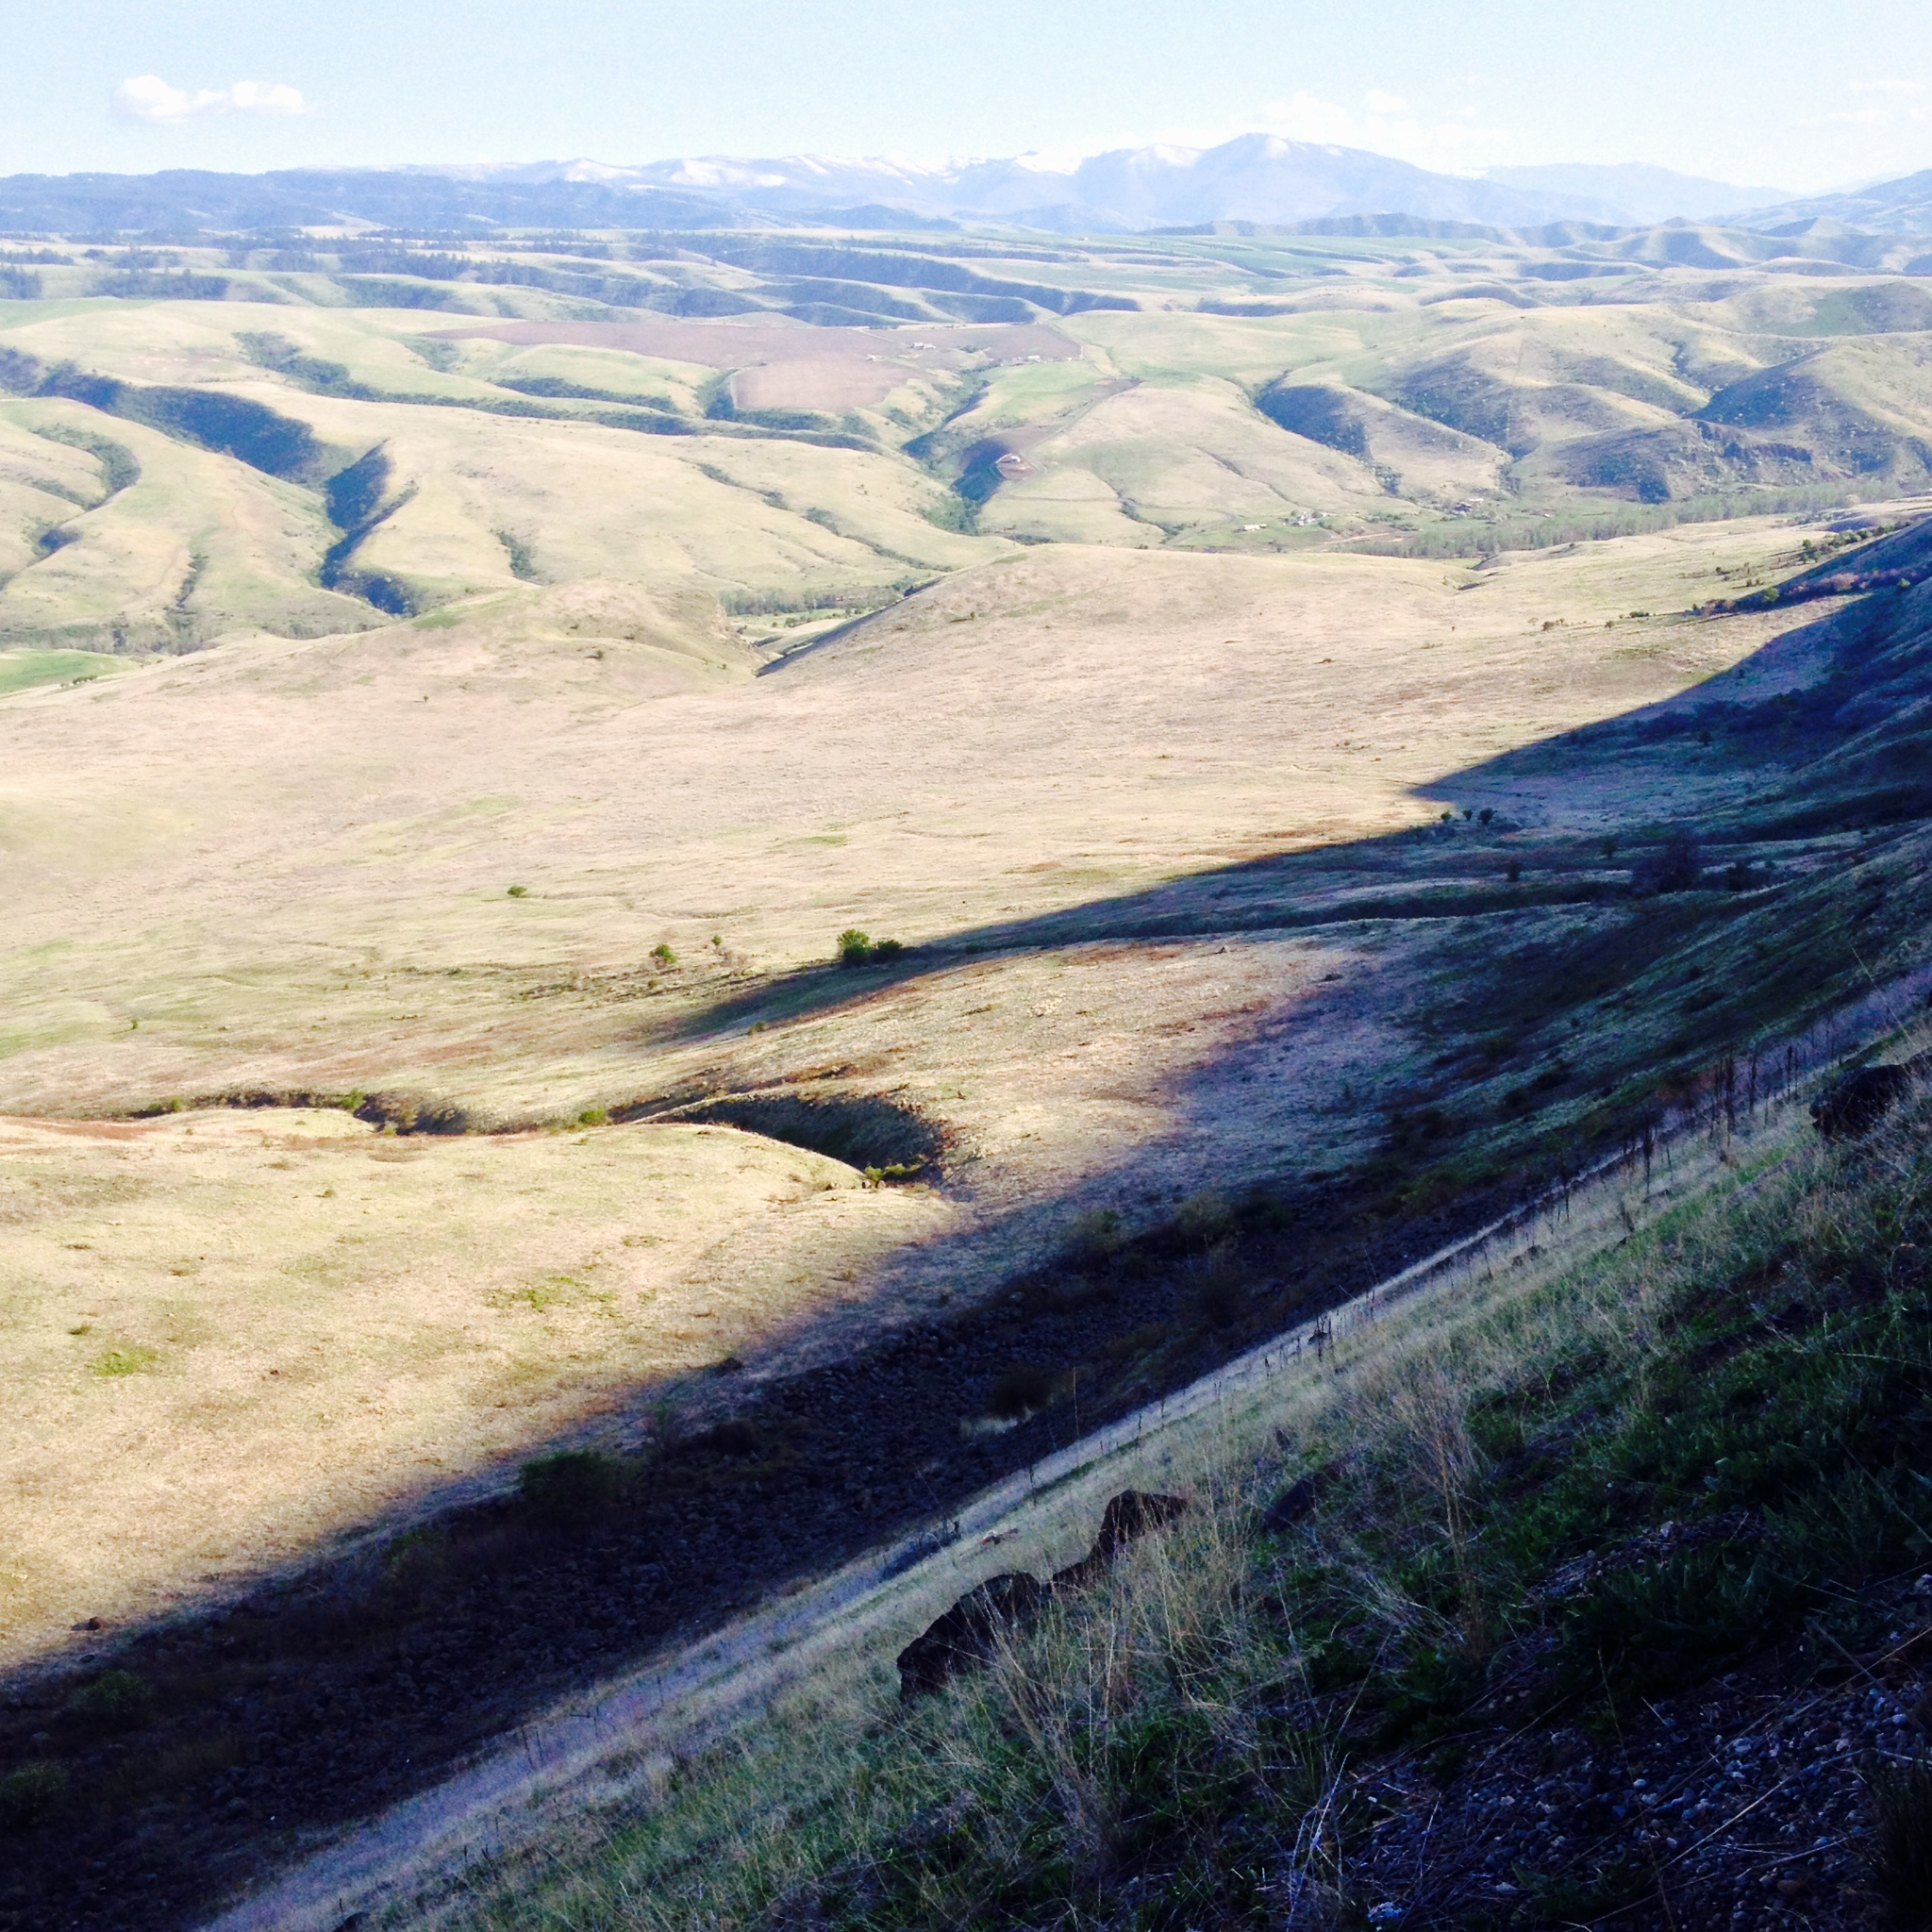 Whitebird Battlefield, Nez Perce